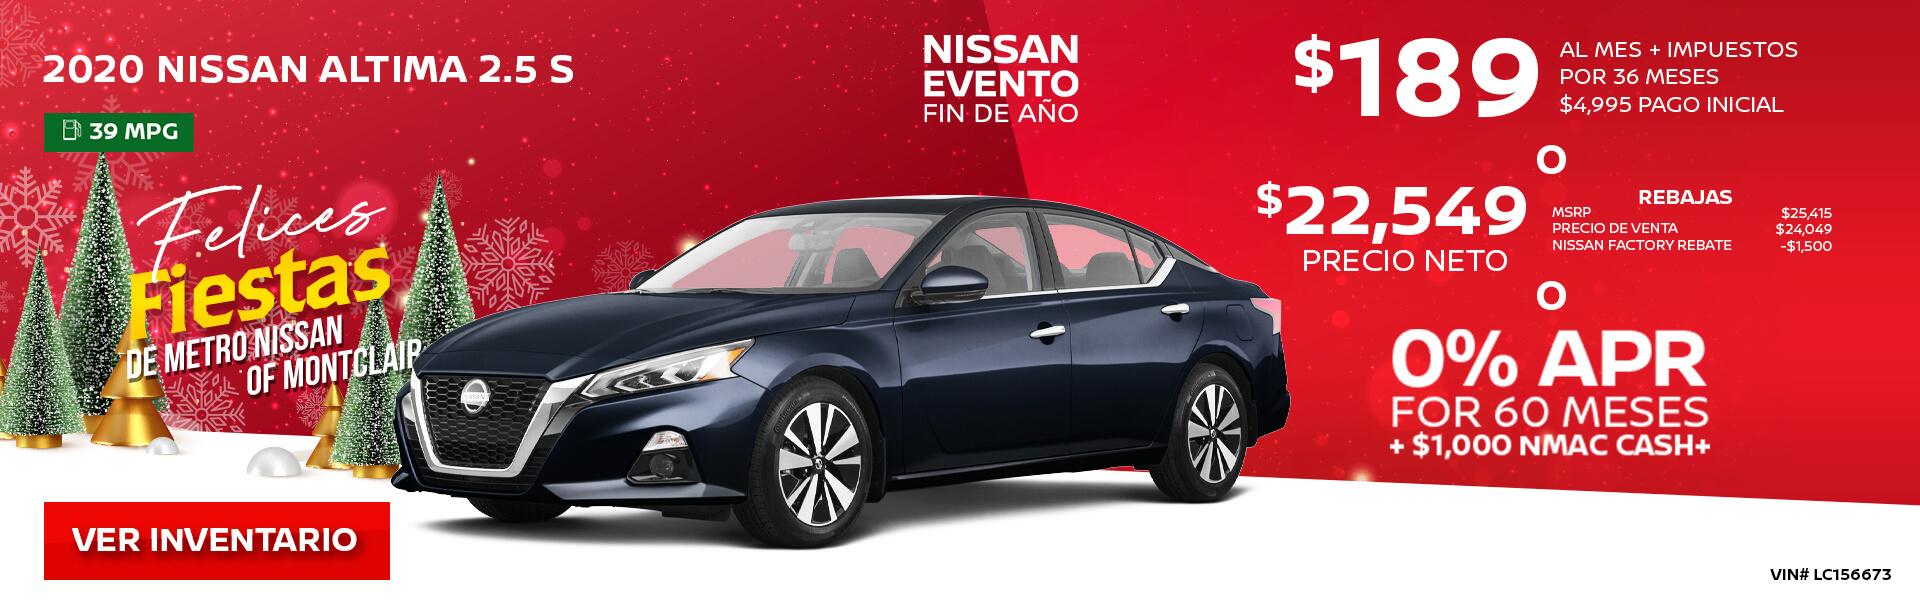 2020 Nissan Altima